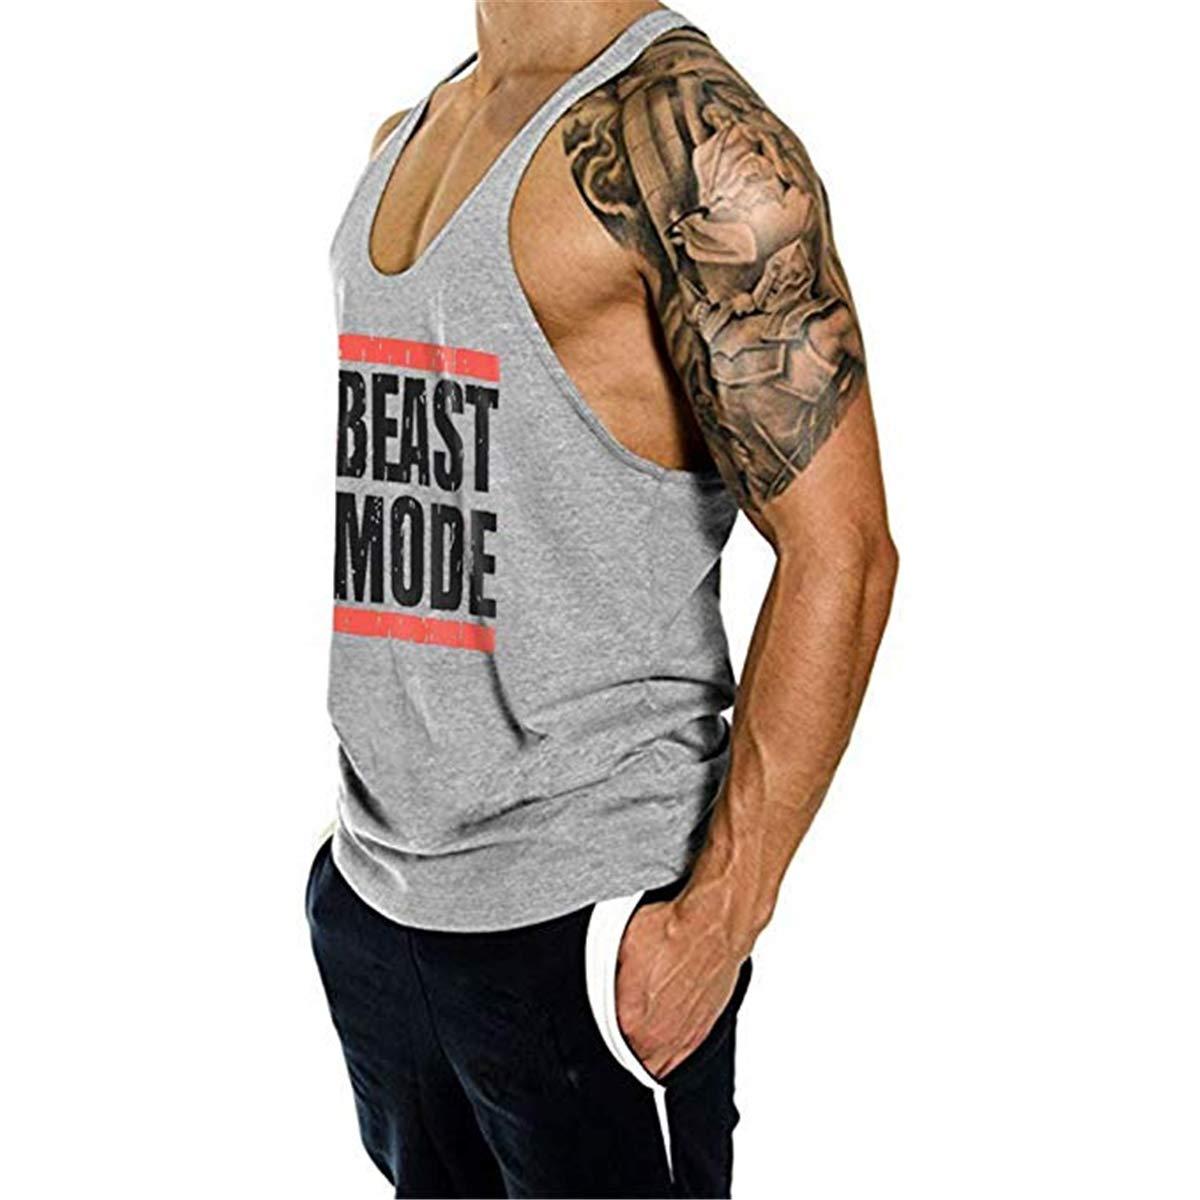 Cabeen Beast Mode Uomo Bodybuilding Canotte Sportivo Canottiera Stringer da Palestra